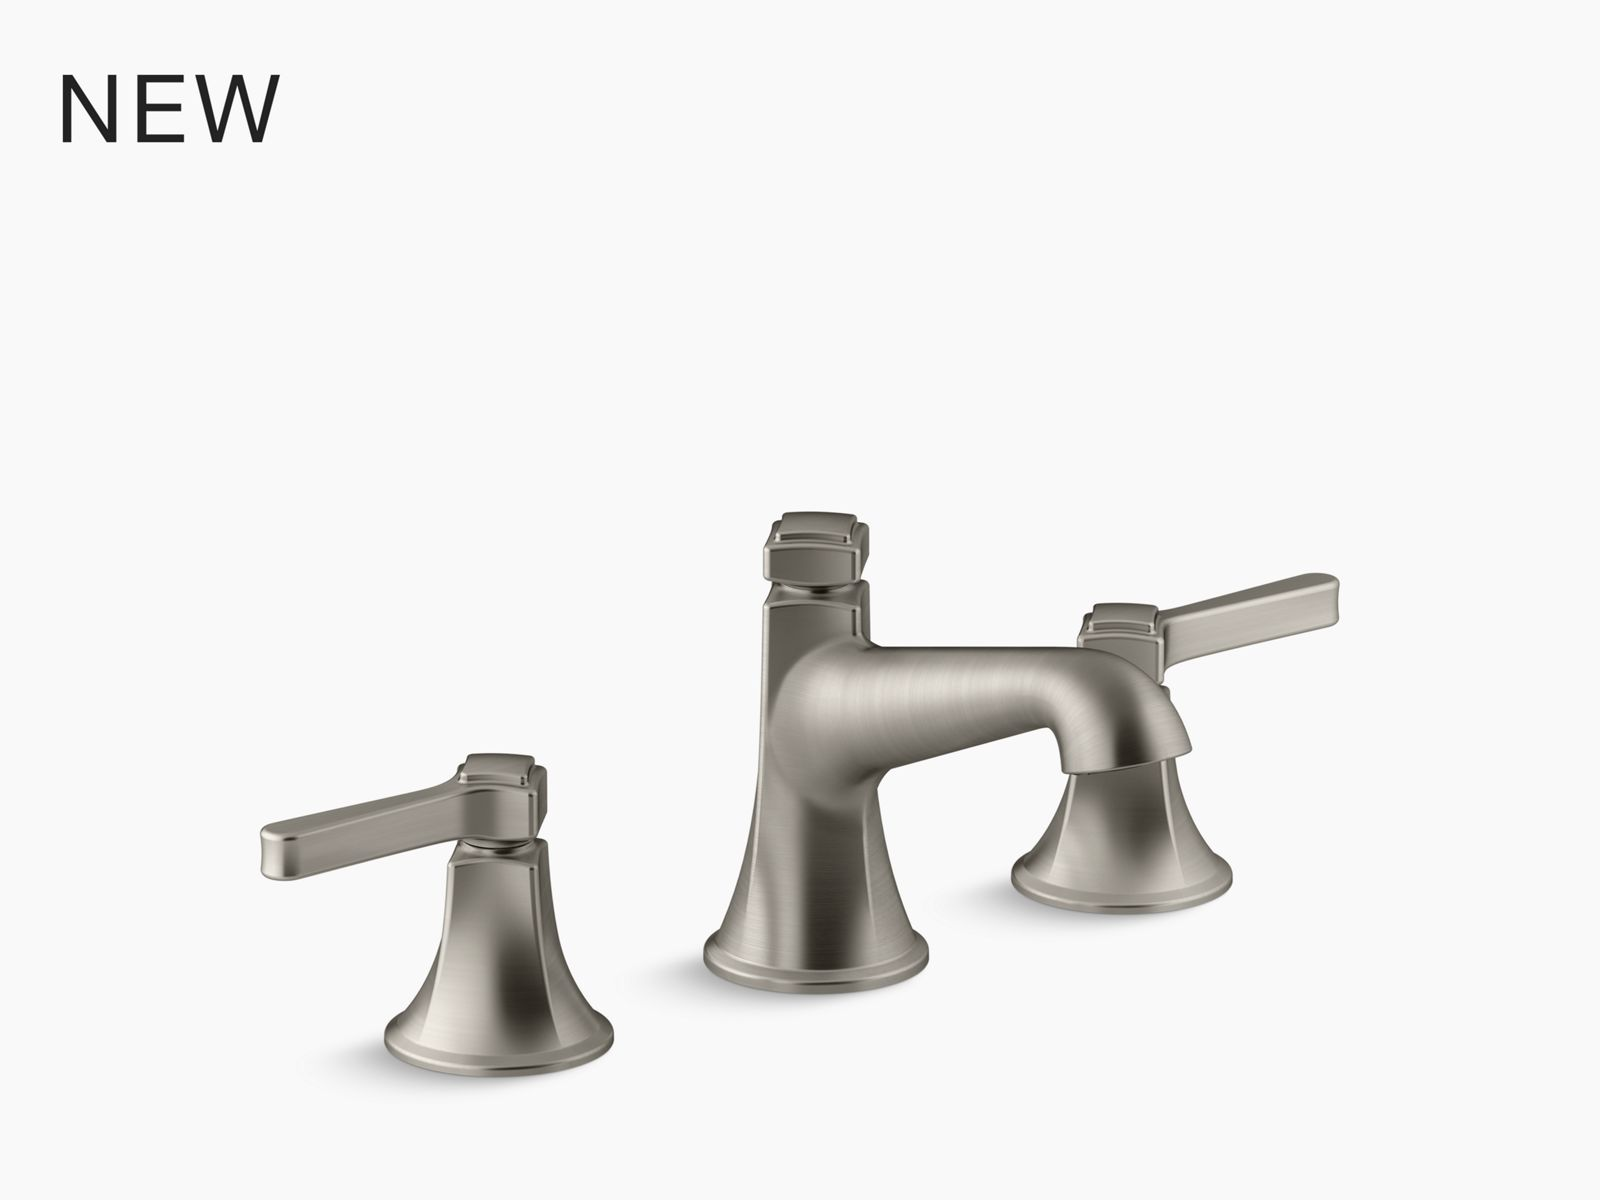 k r99903 4g willamette bath and